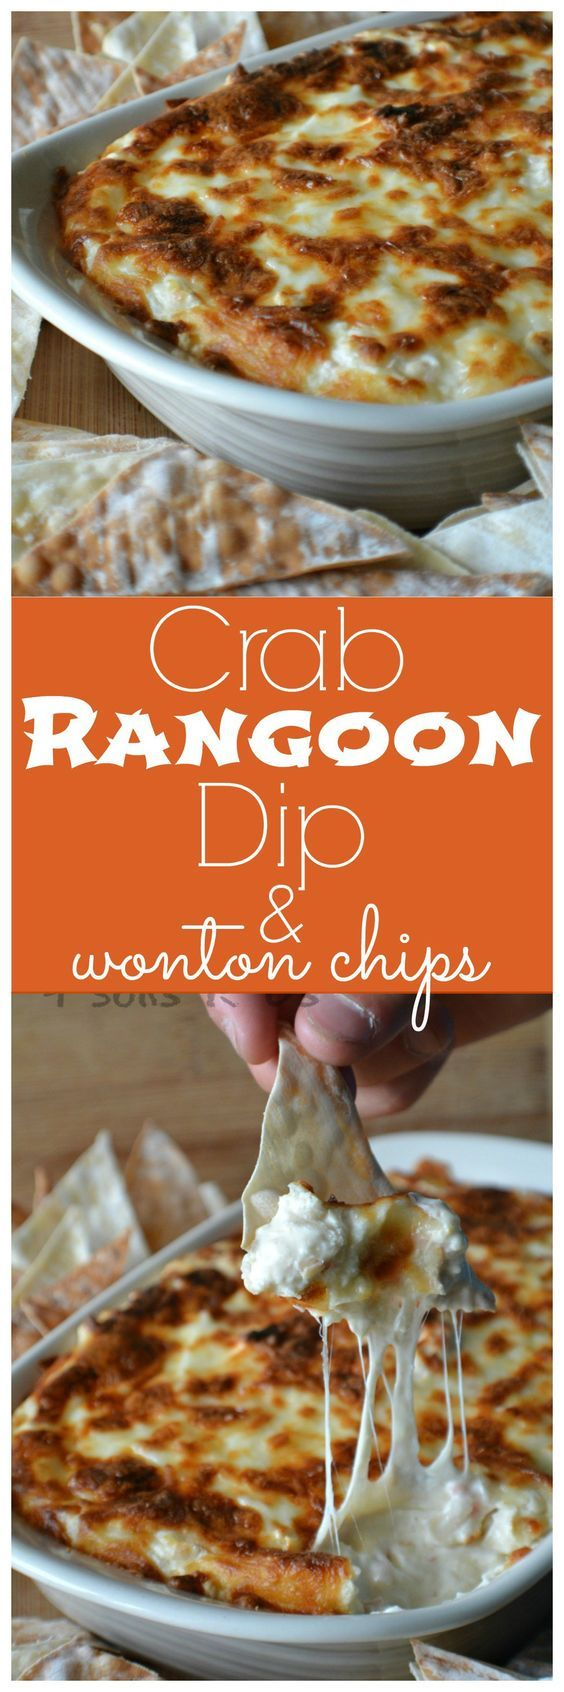 Crab Rangoon Dip With Wonton Chips #favourites